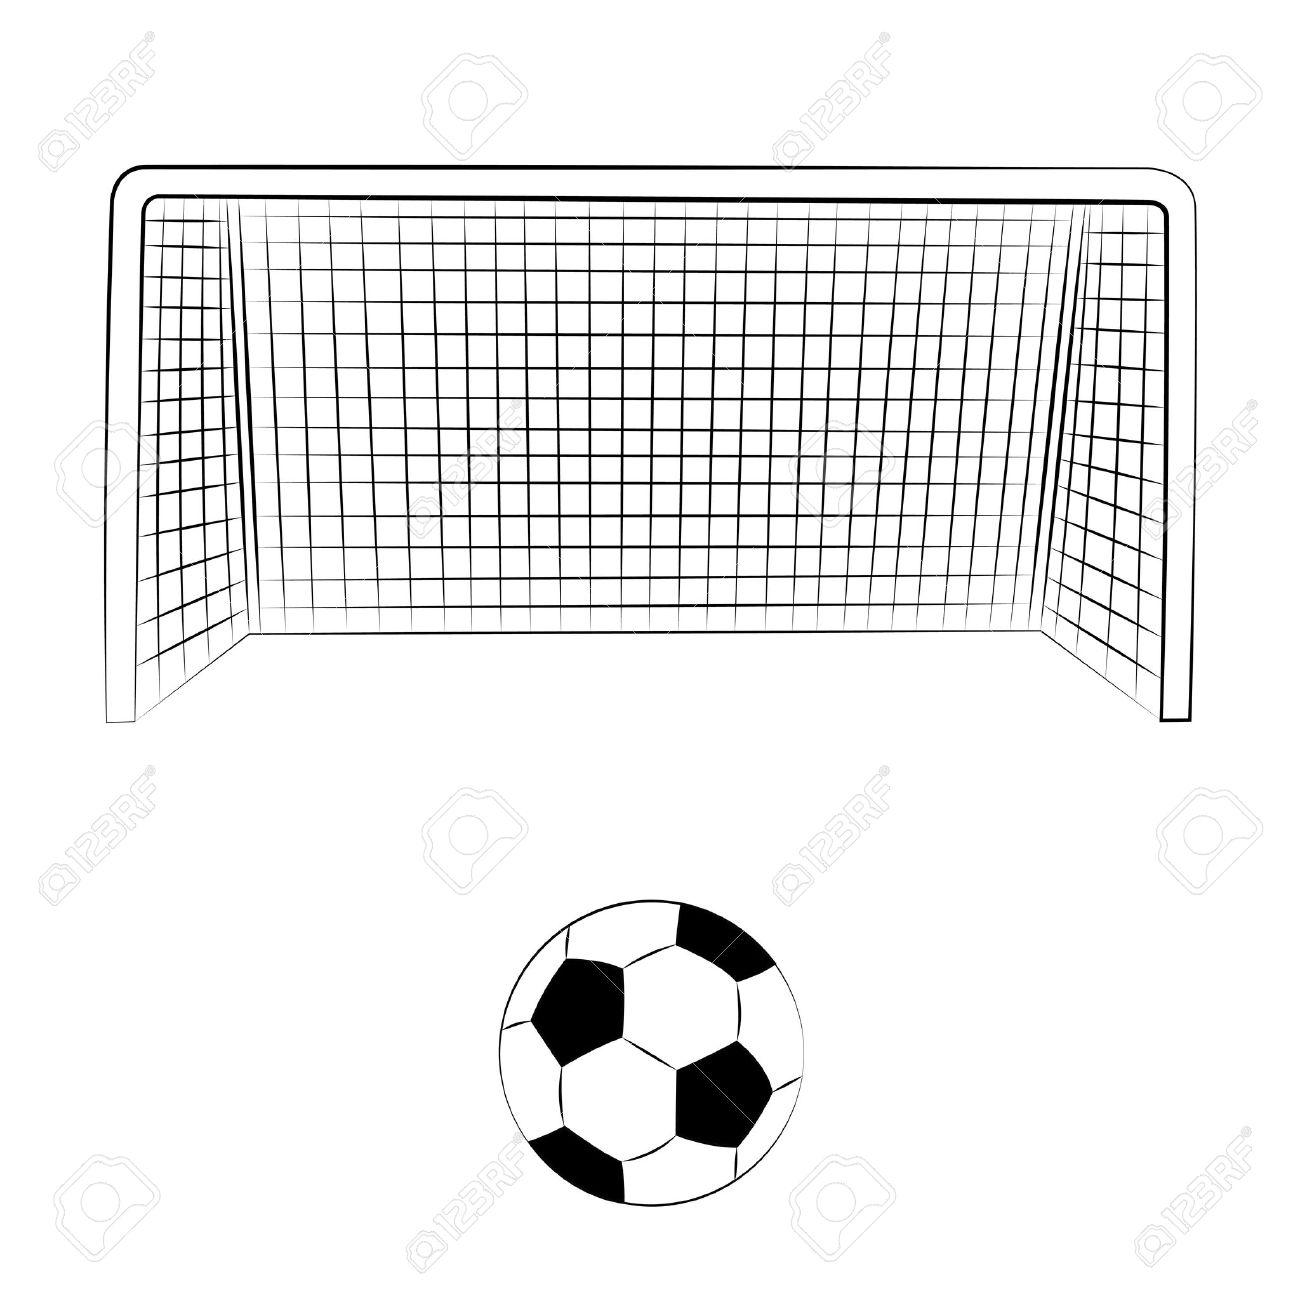 Clip art free panda. Goal clipart soccer game